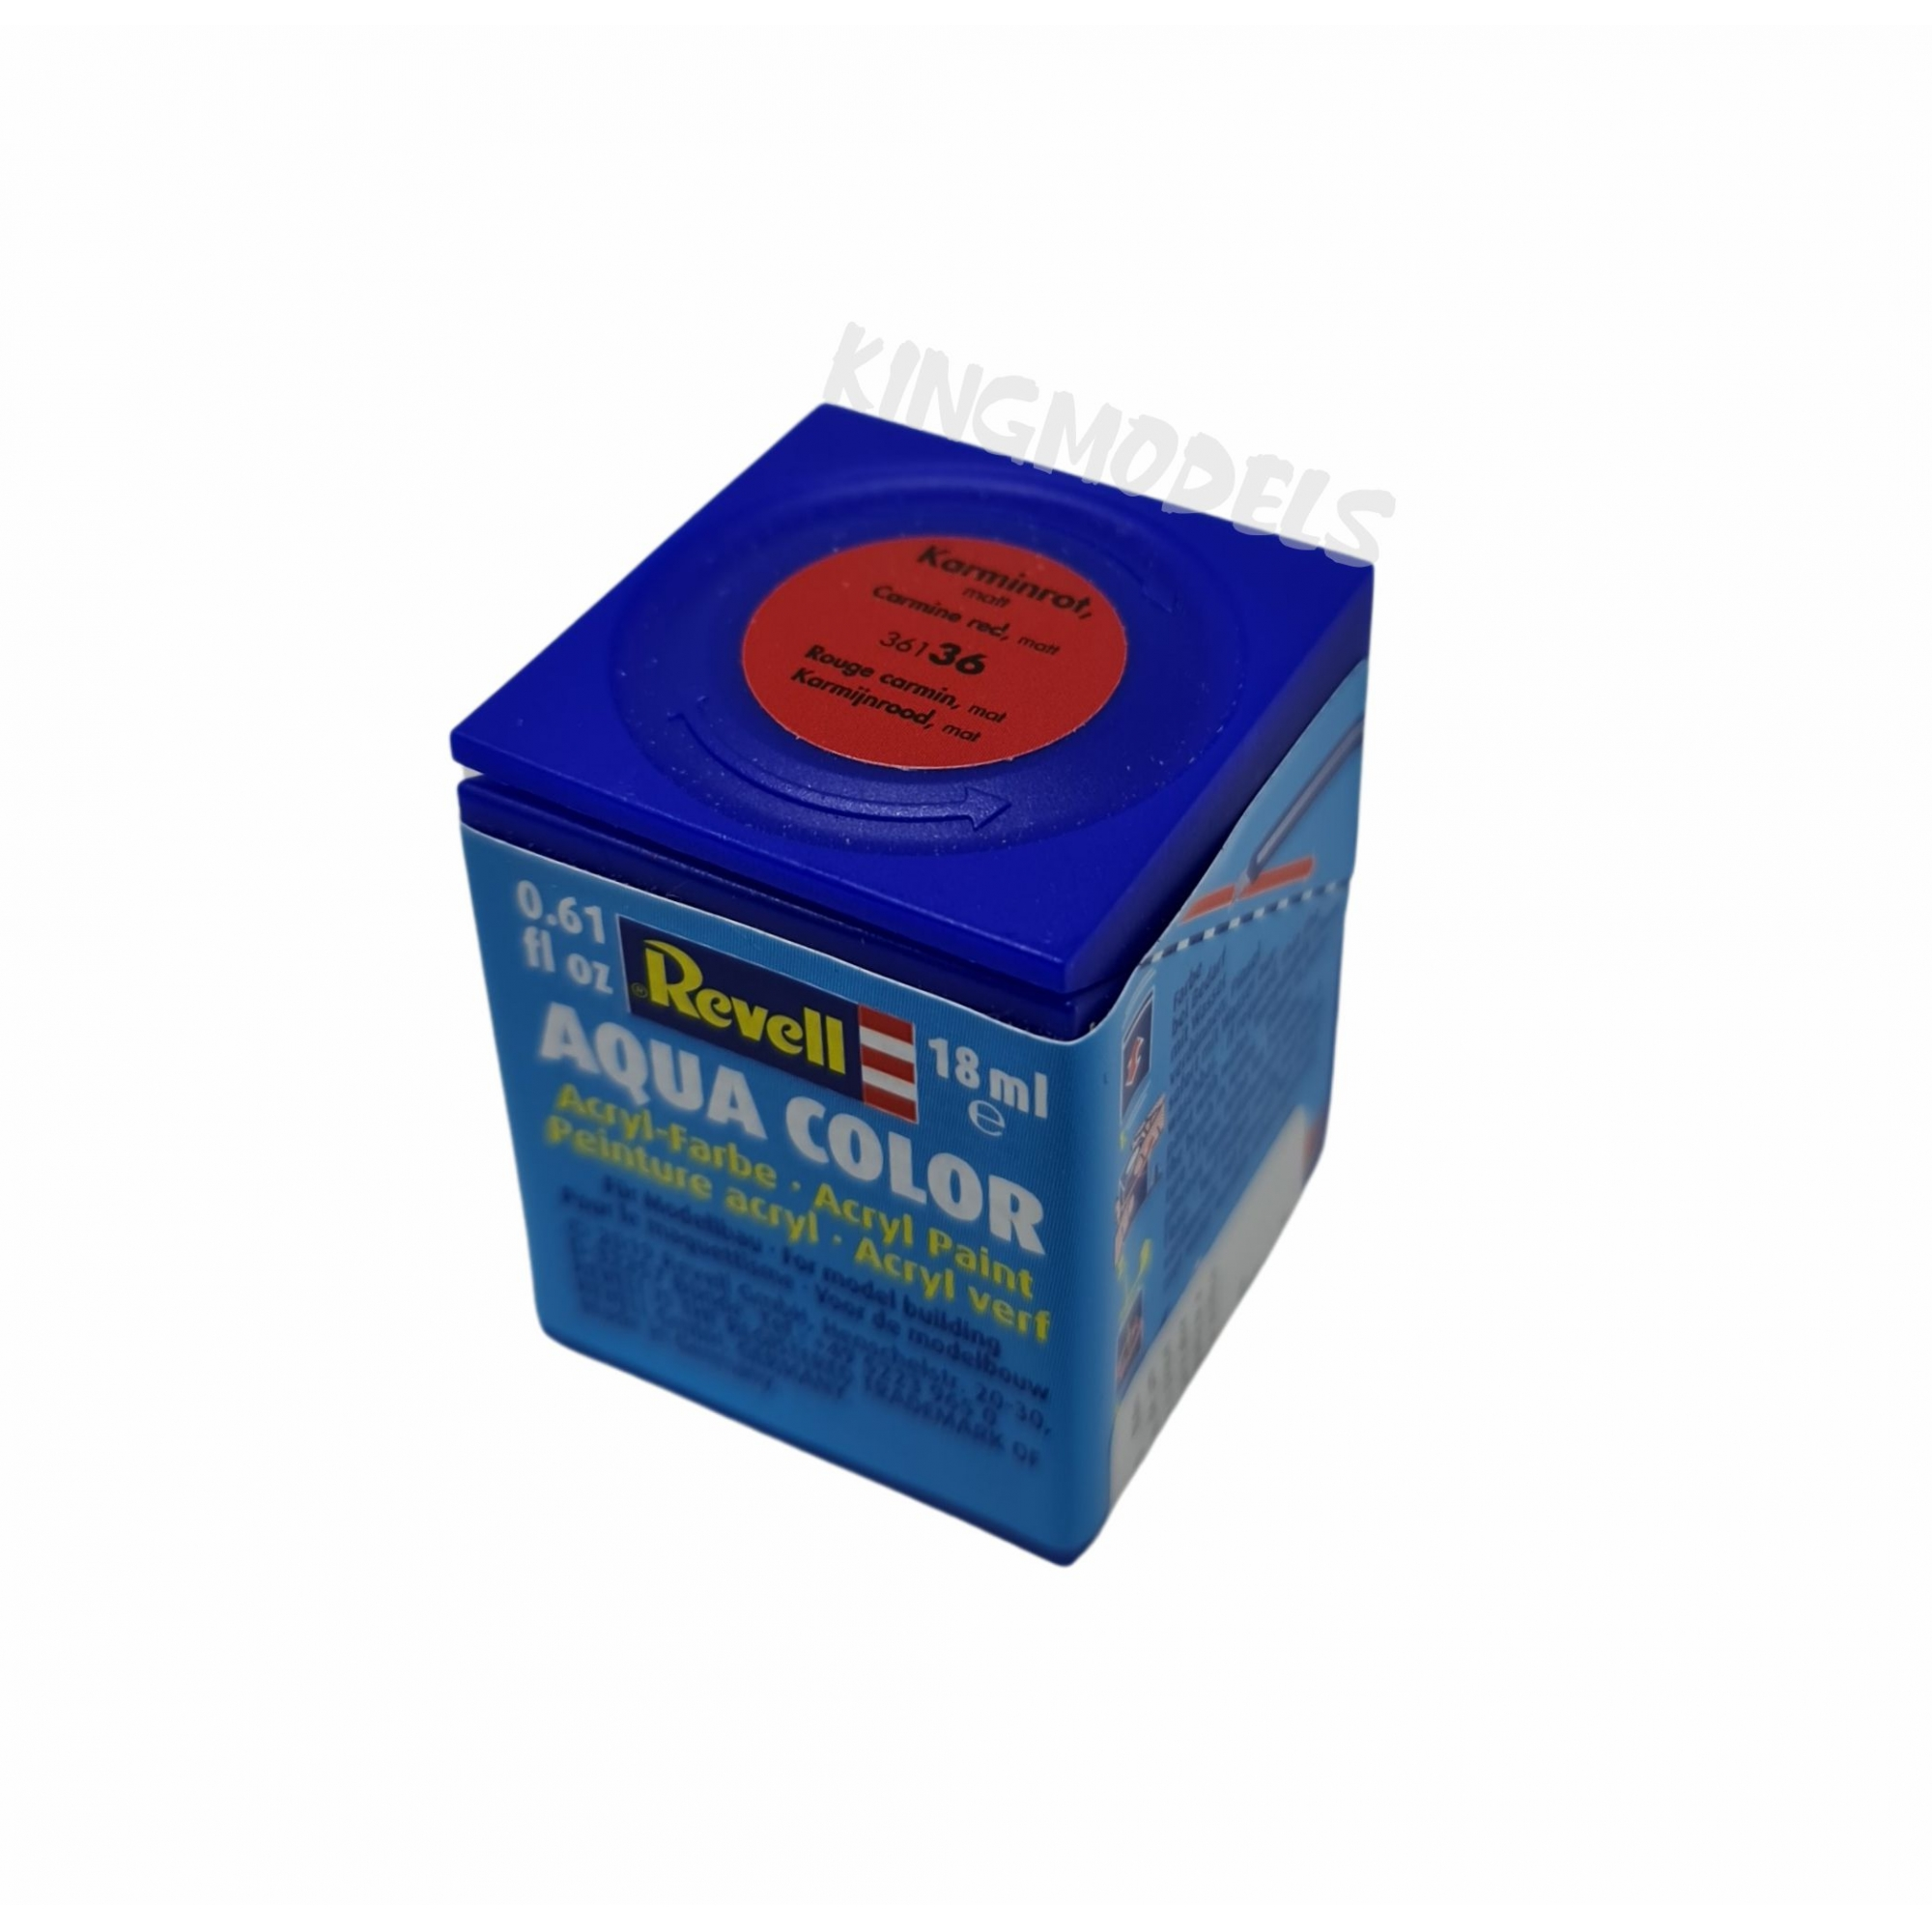 Tinta Revell - Aqua Color - Cod 36136 - Carmine Red -18ml  - King Models